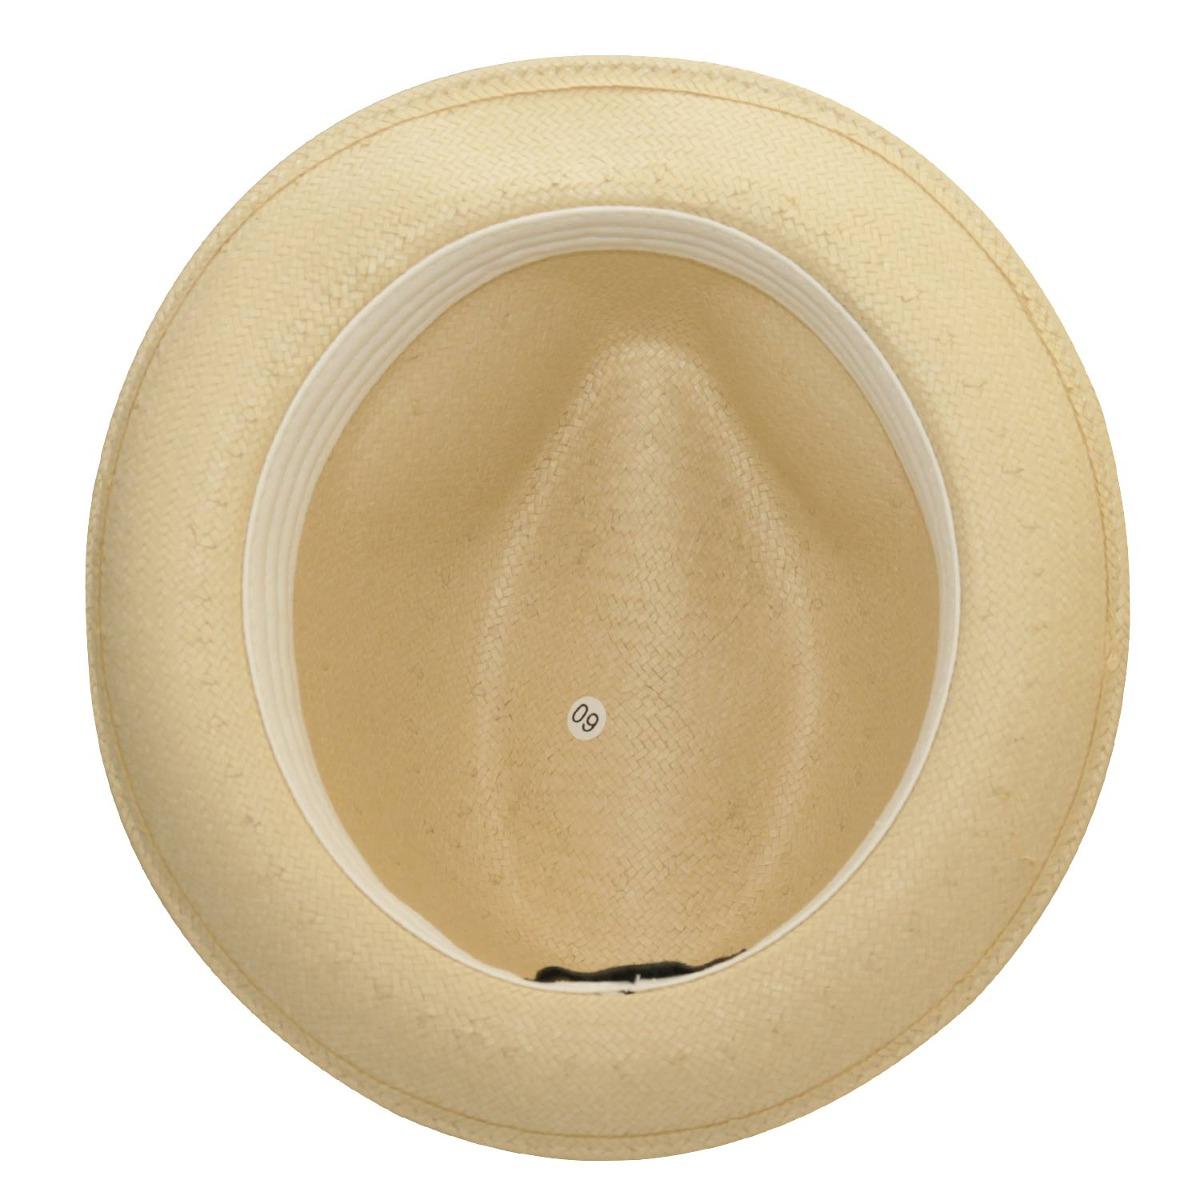 2da05676a16f2 chapéu fedora palha aba curta marcatto-bege-tam 54. Carregando zoom.